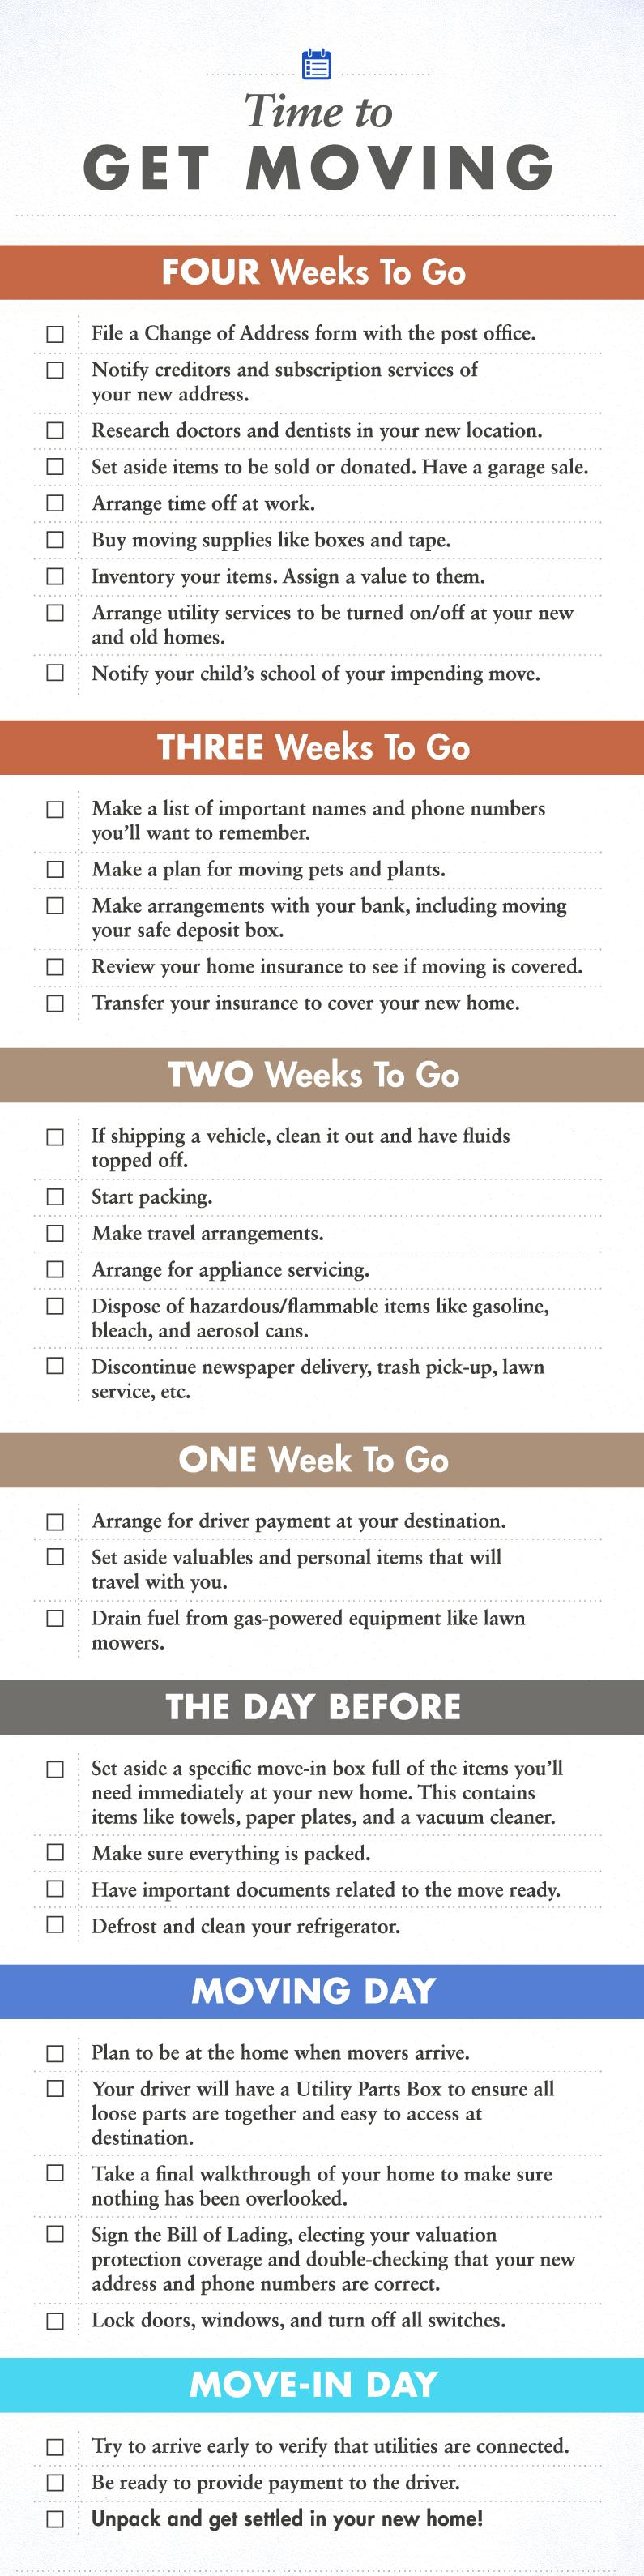 moving checklist infographic florida